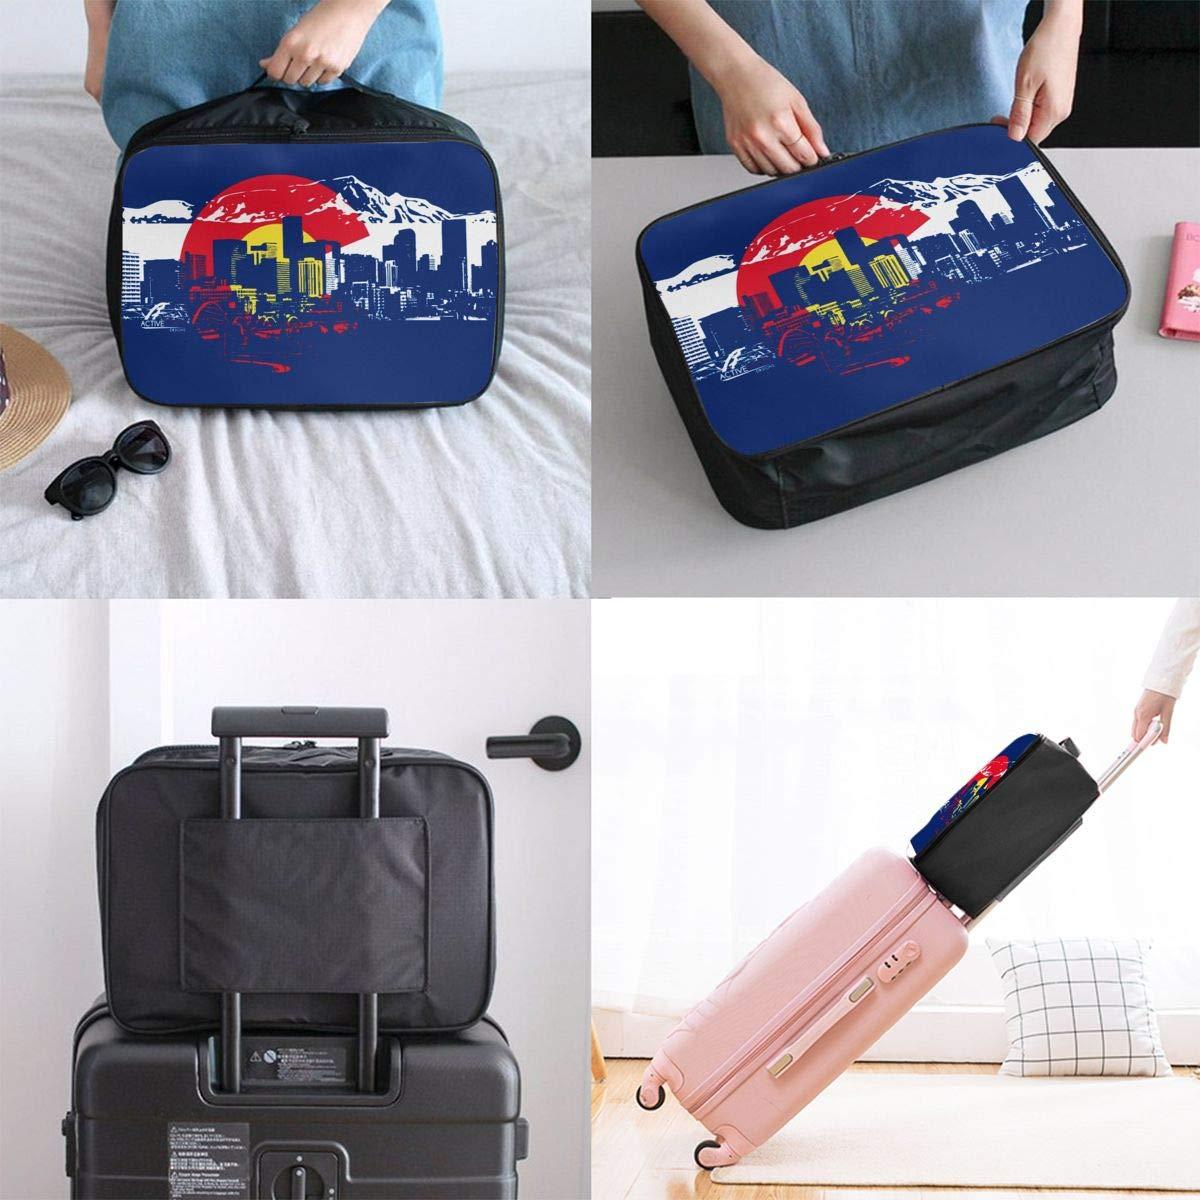 Colorado Flag Travel Bag Portable Luggage Bags Duffle Bag Large Capacity Travel Organizer Bag